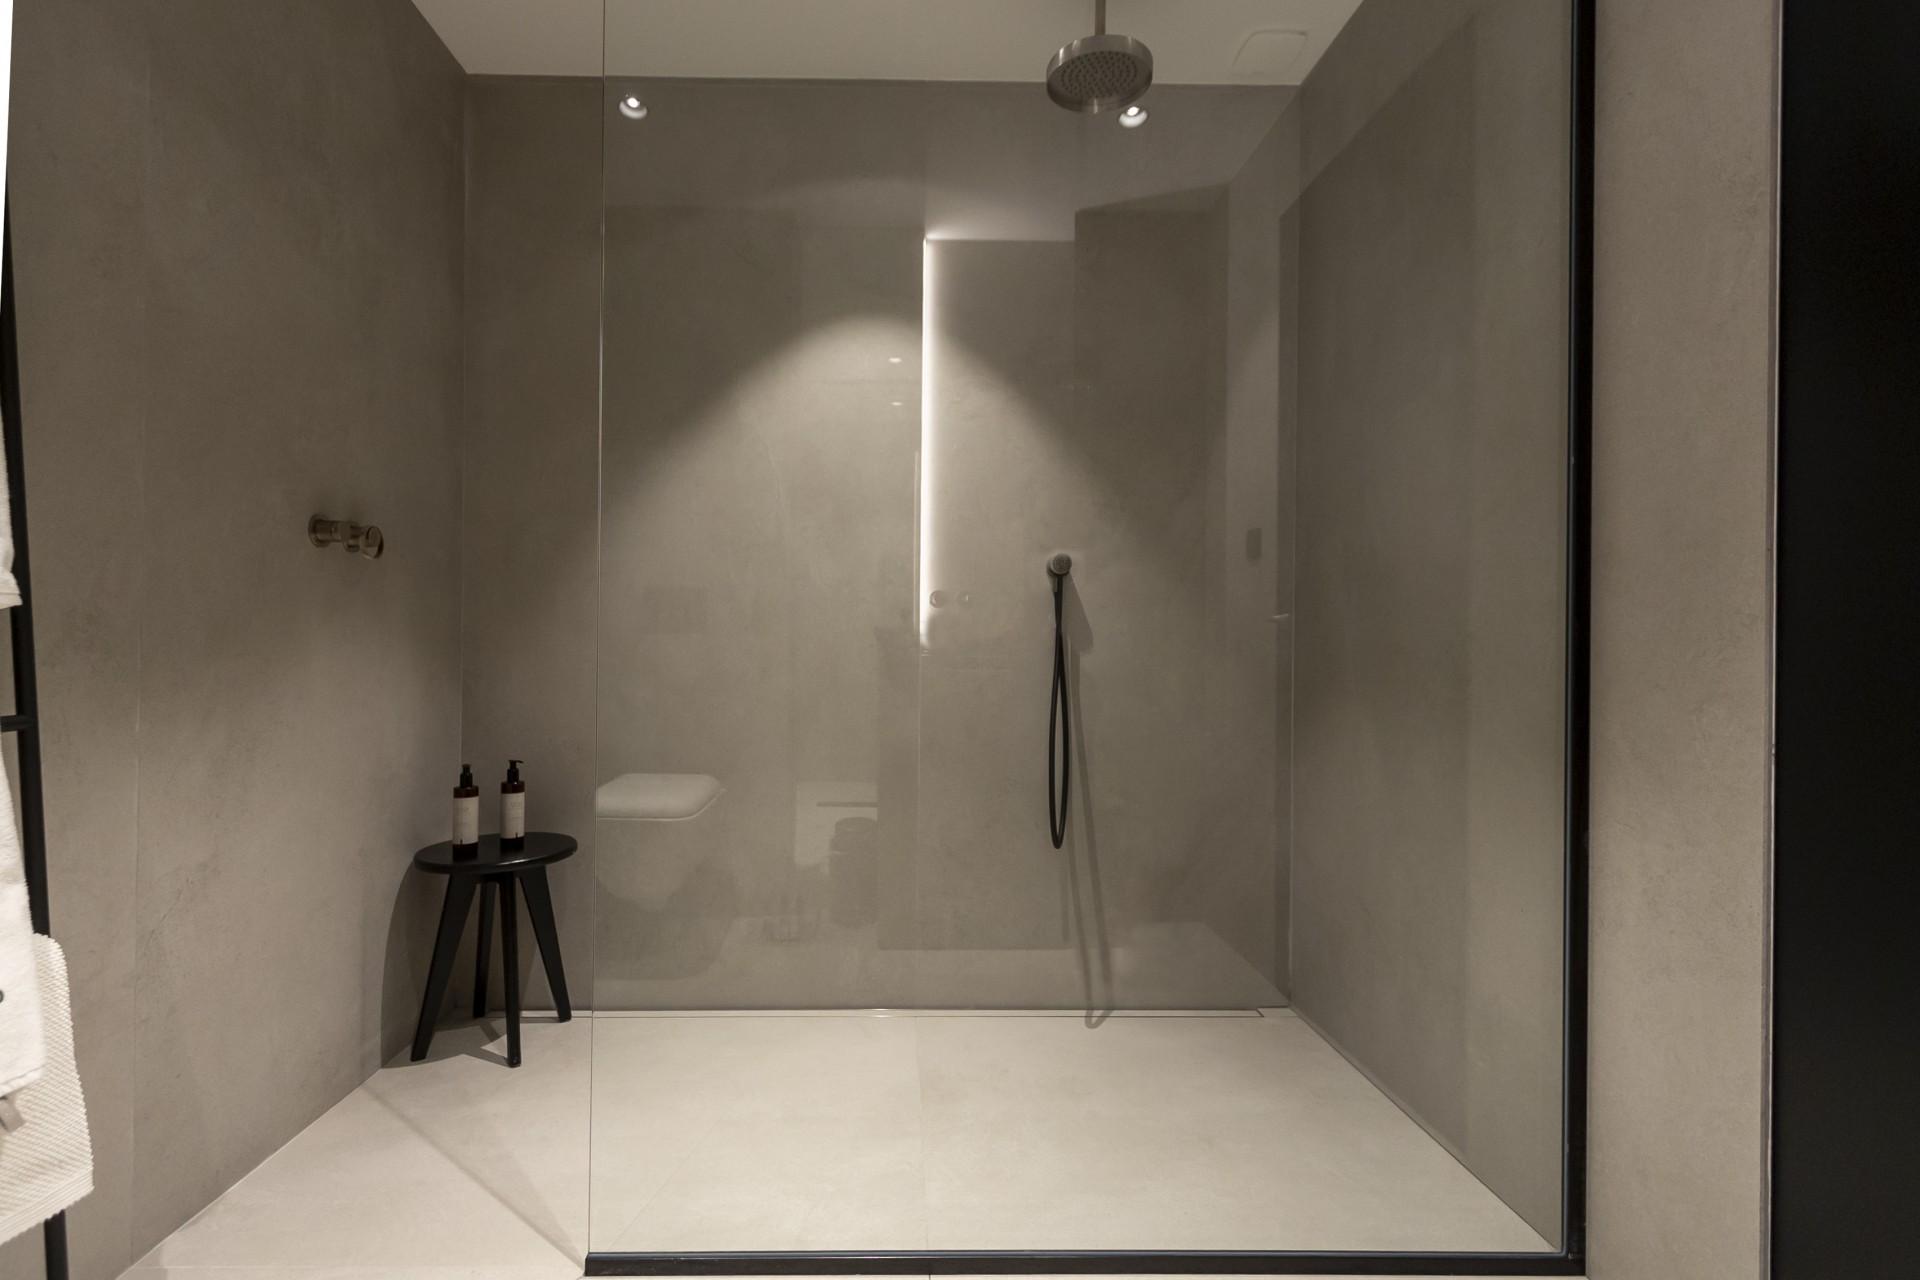 Propriano Luxury Rental Villa Pyrale Shower Room 2